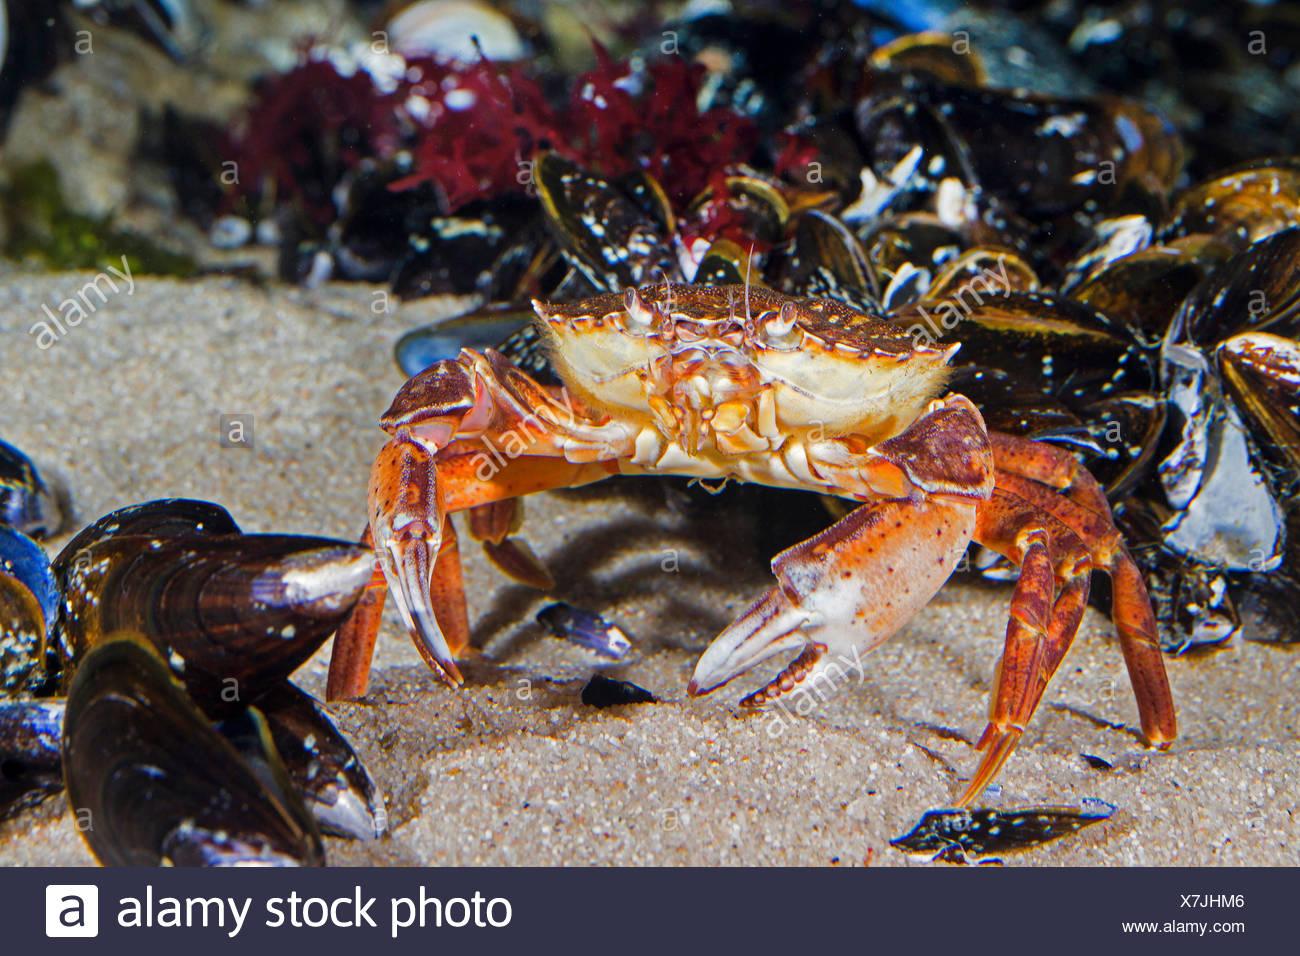 Green shore crab, Green crab, North Atlantic shore crab (Carcinus maenas), on the beach - Stock Image